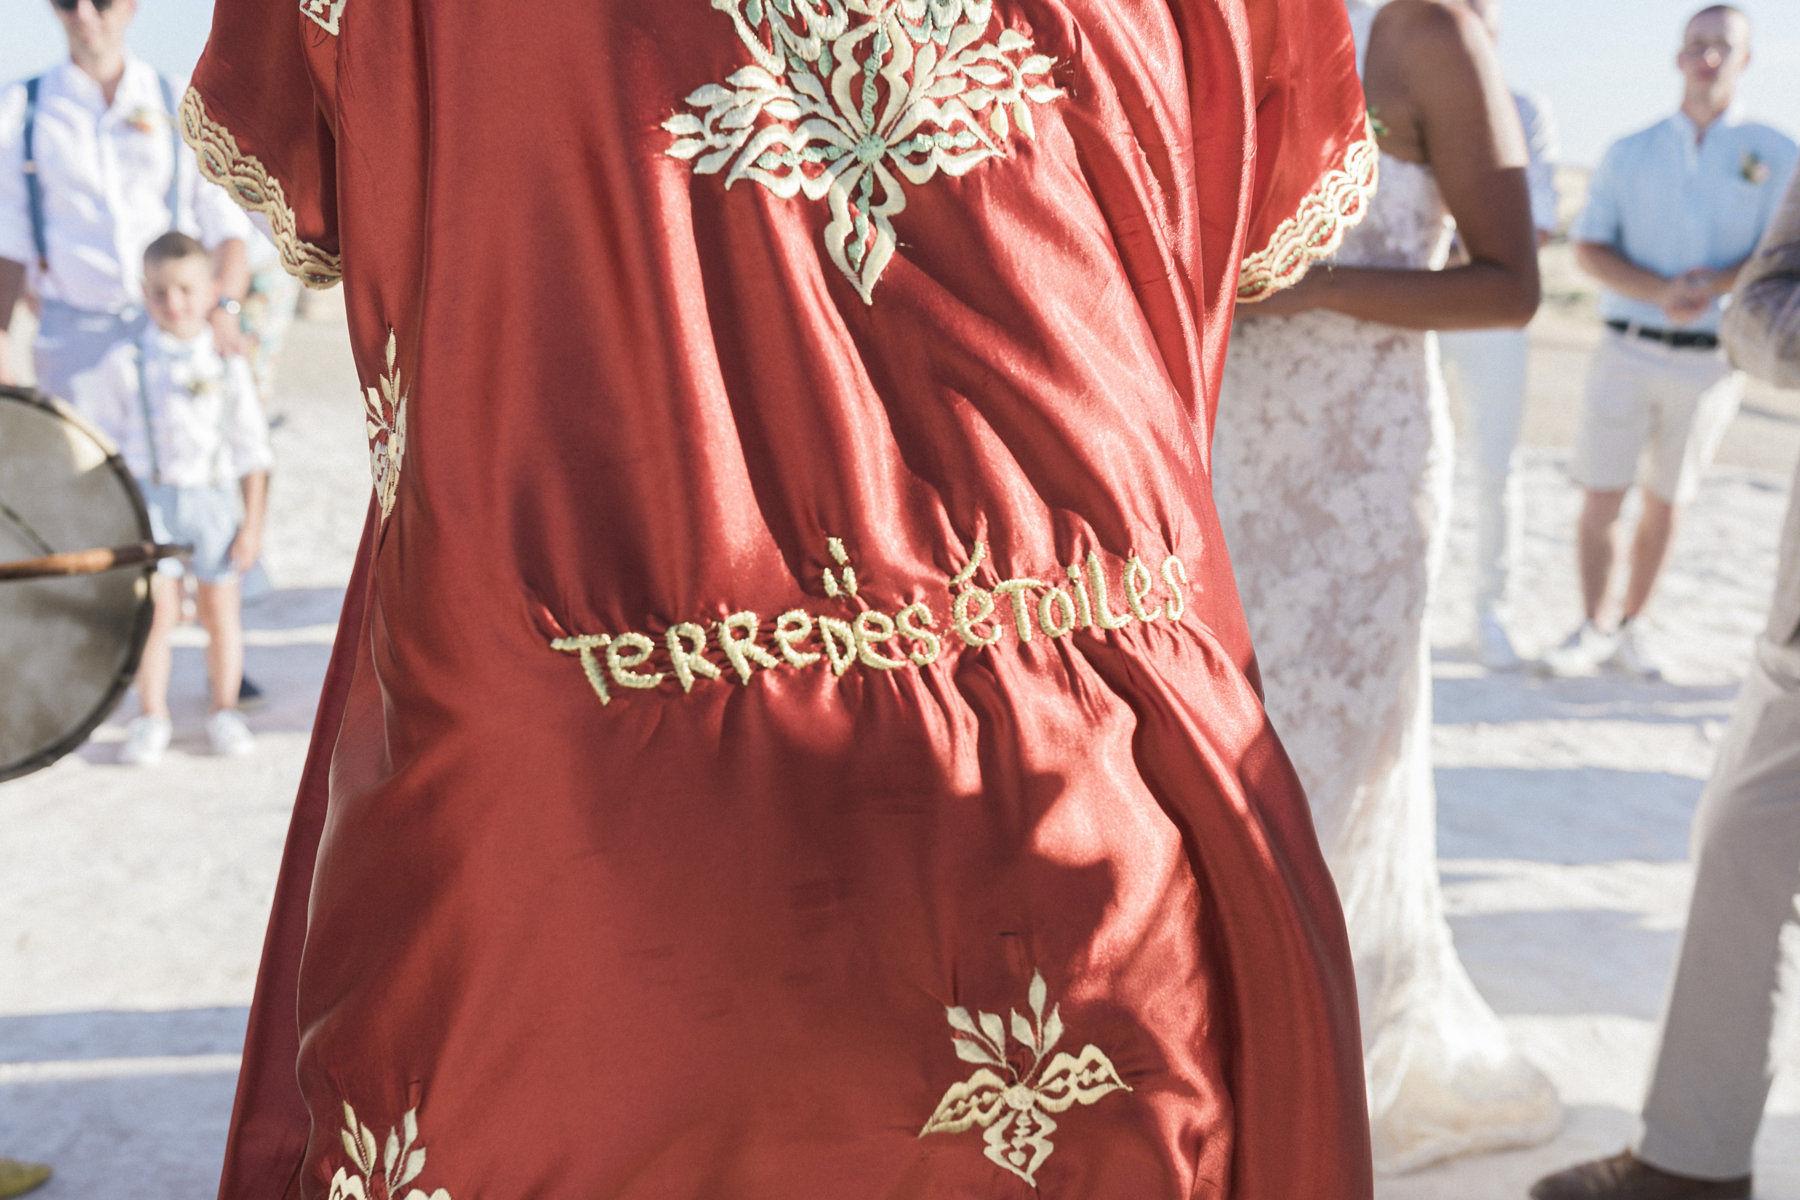 mariarao_terredesetoiles-410web.jpg